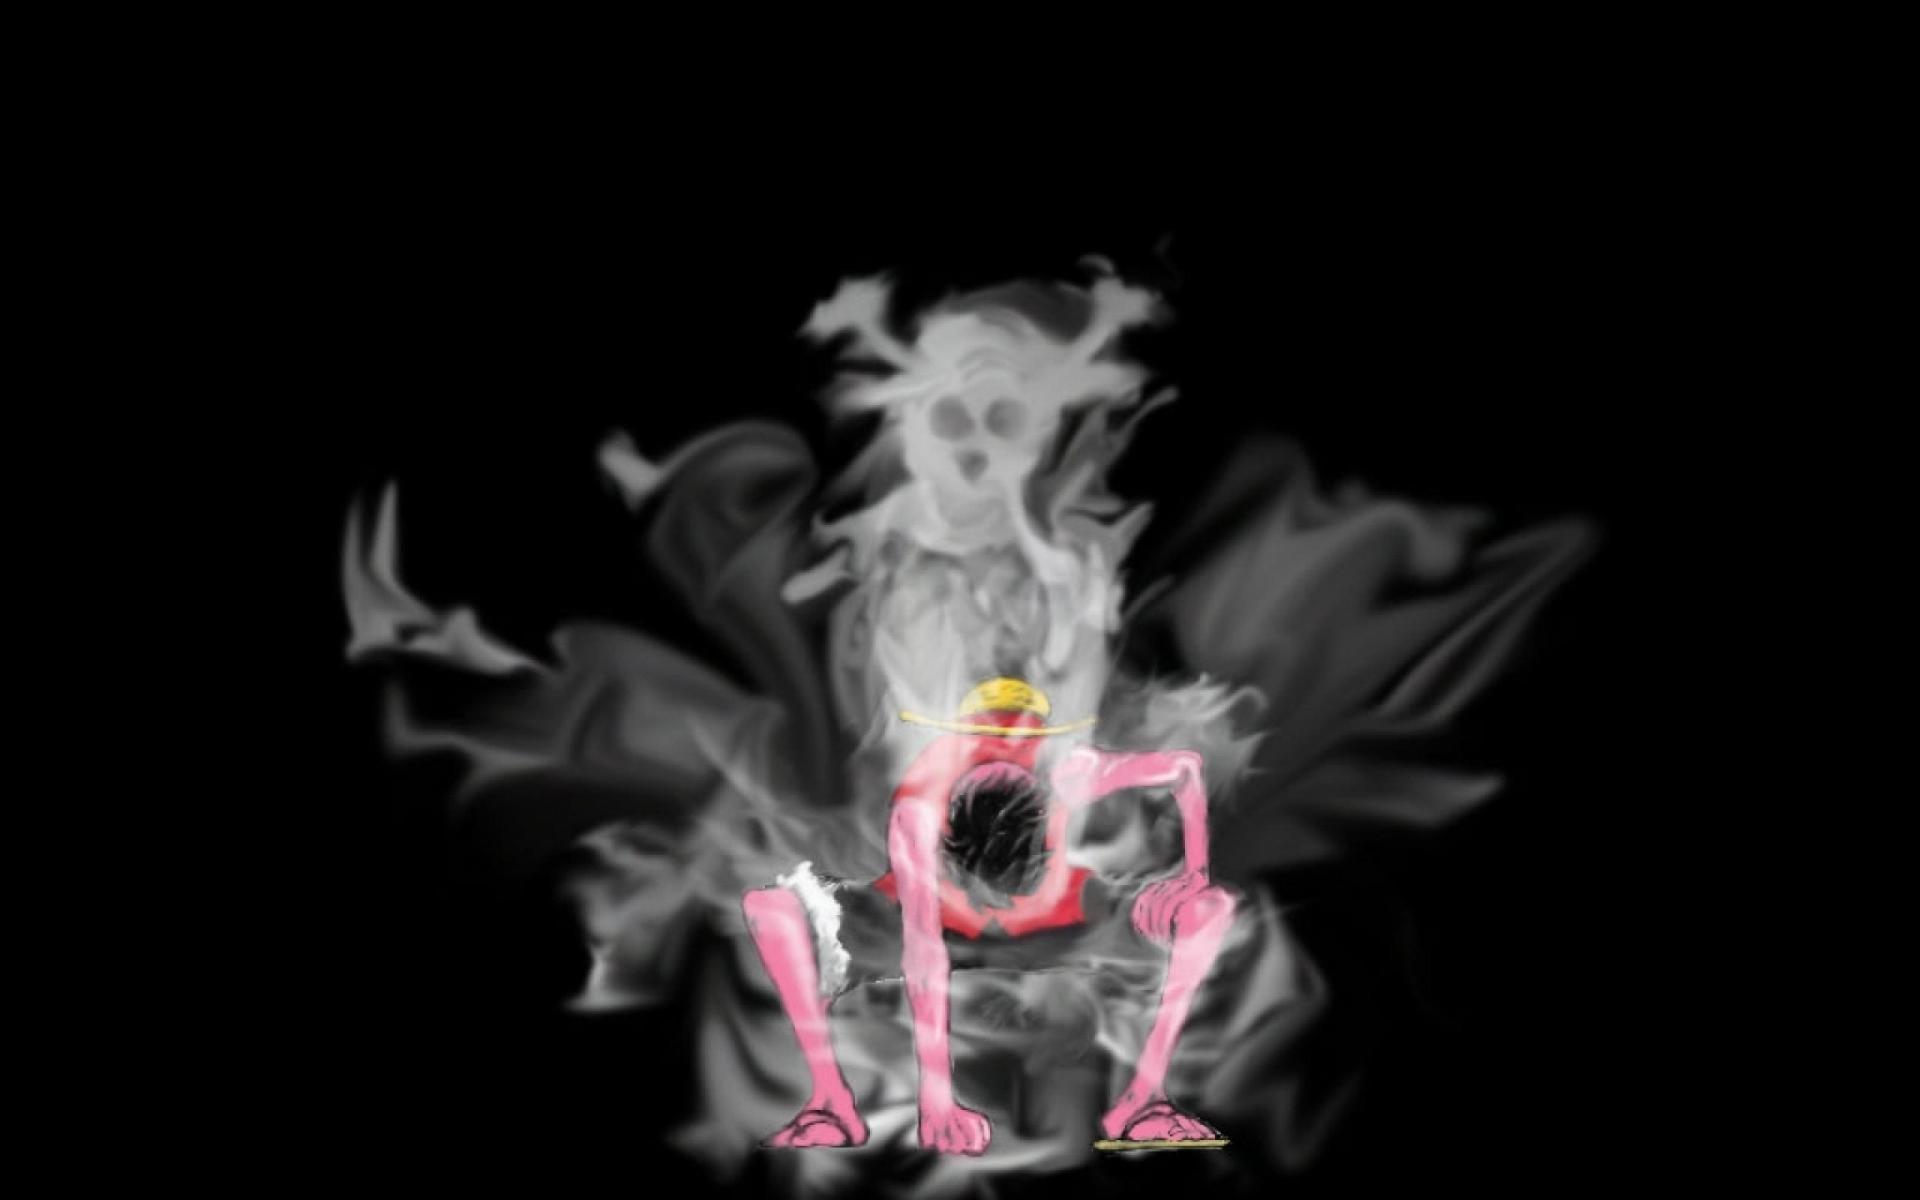 D-One-Piece-Live-wallpaper-wp3604505